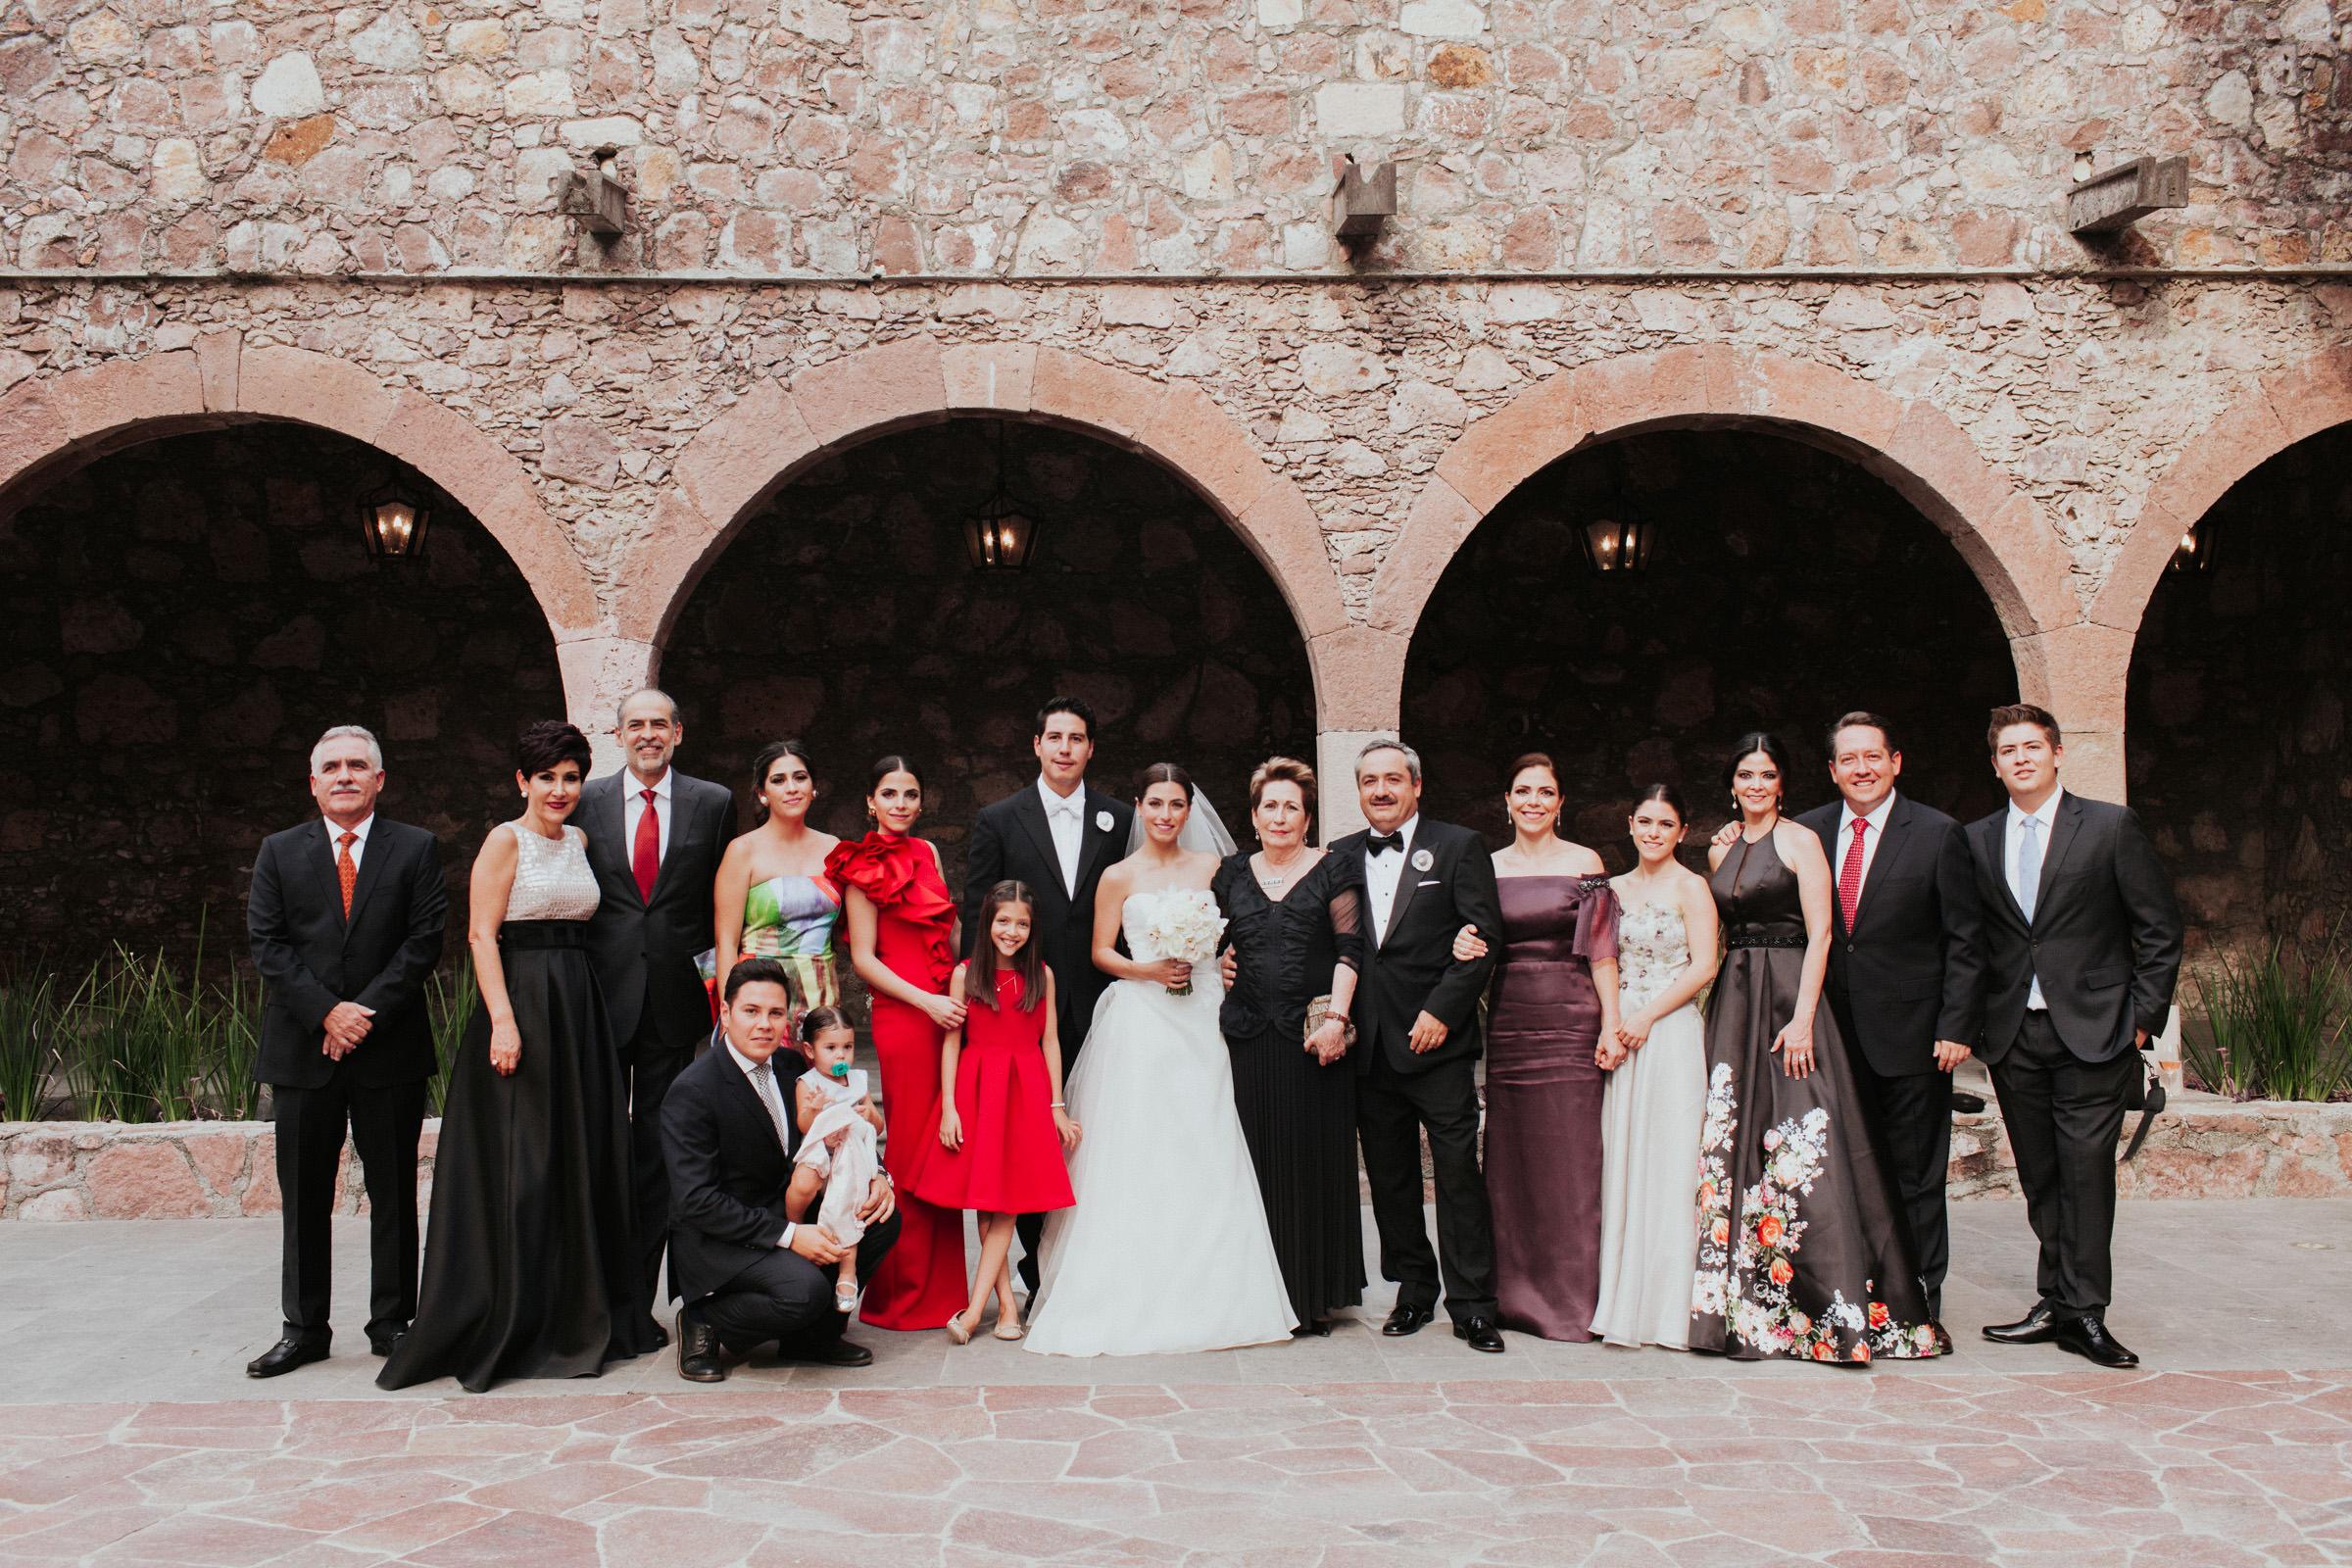 Boda-Leon-Guanajuato-Casa-de-Piedra-Isabella-Daniel-Pierce--119.jpg